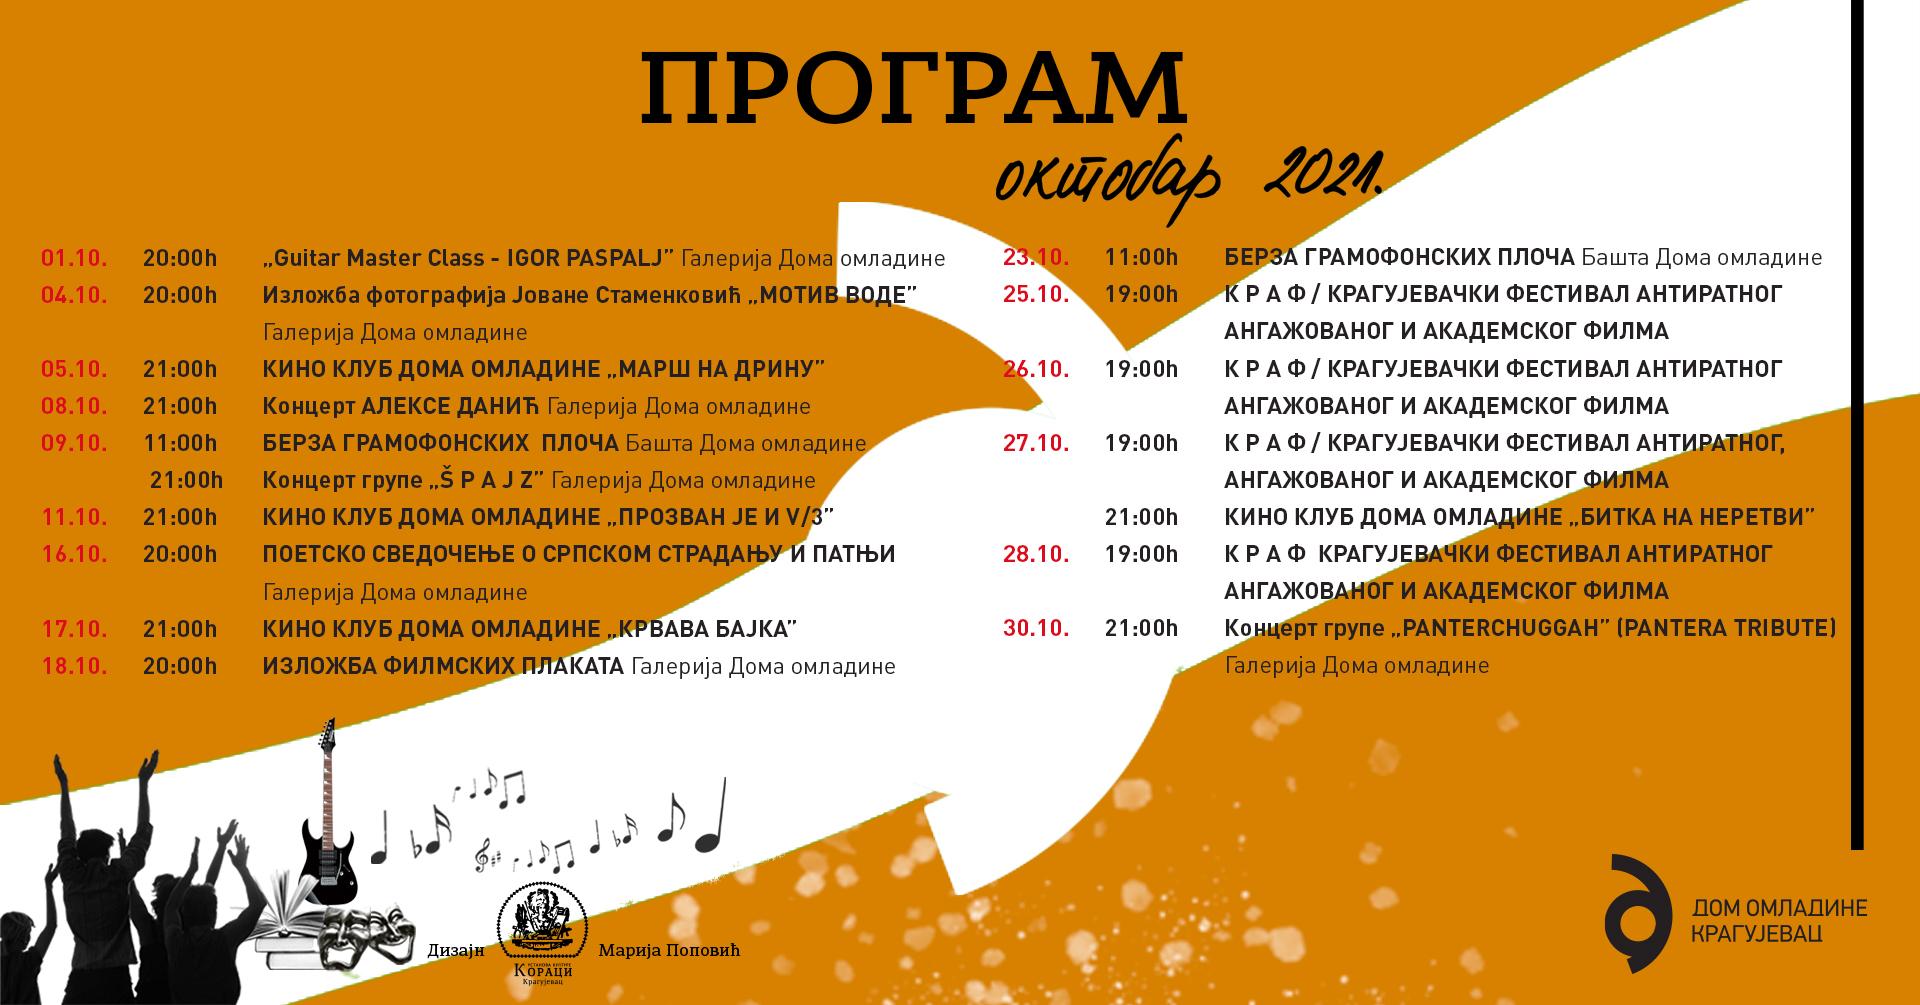 BANER-program-oktobar-2021_-FB-event